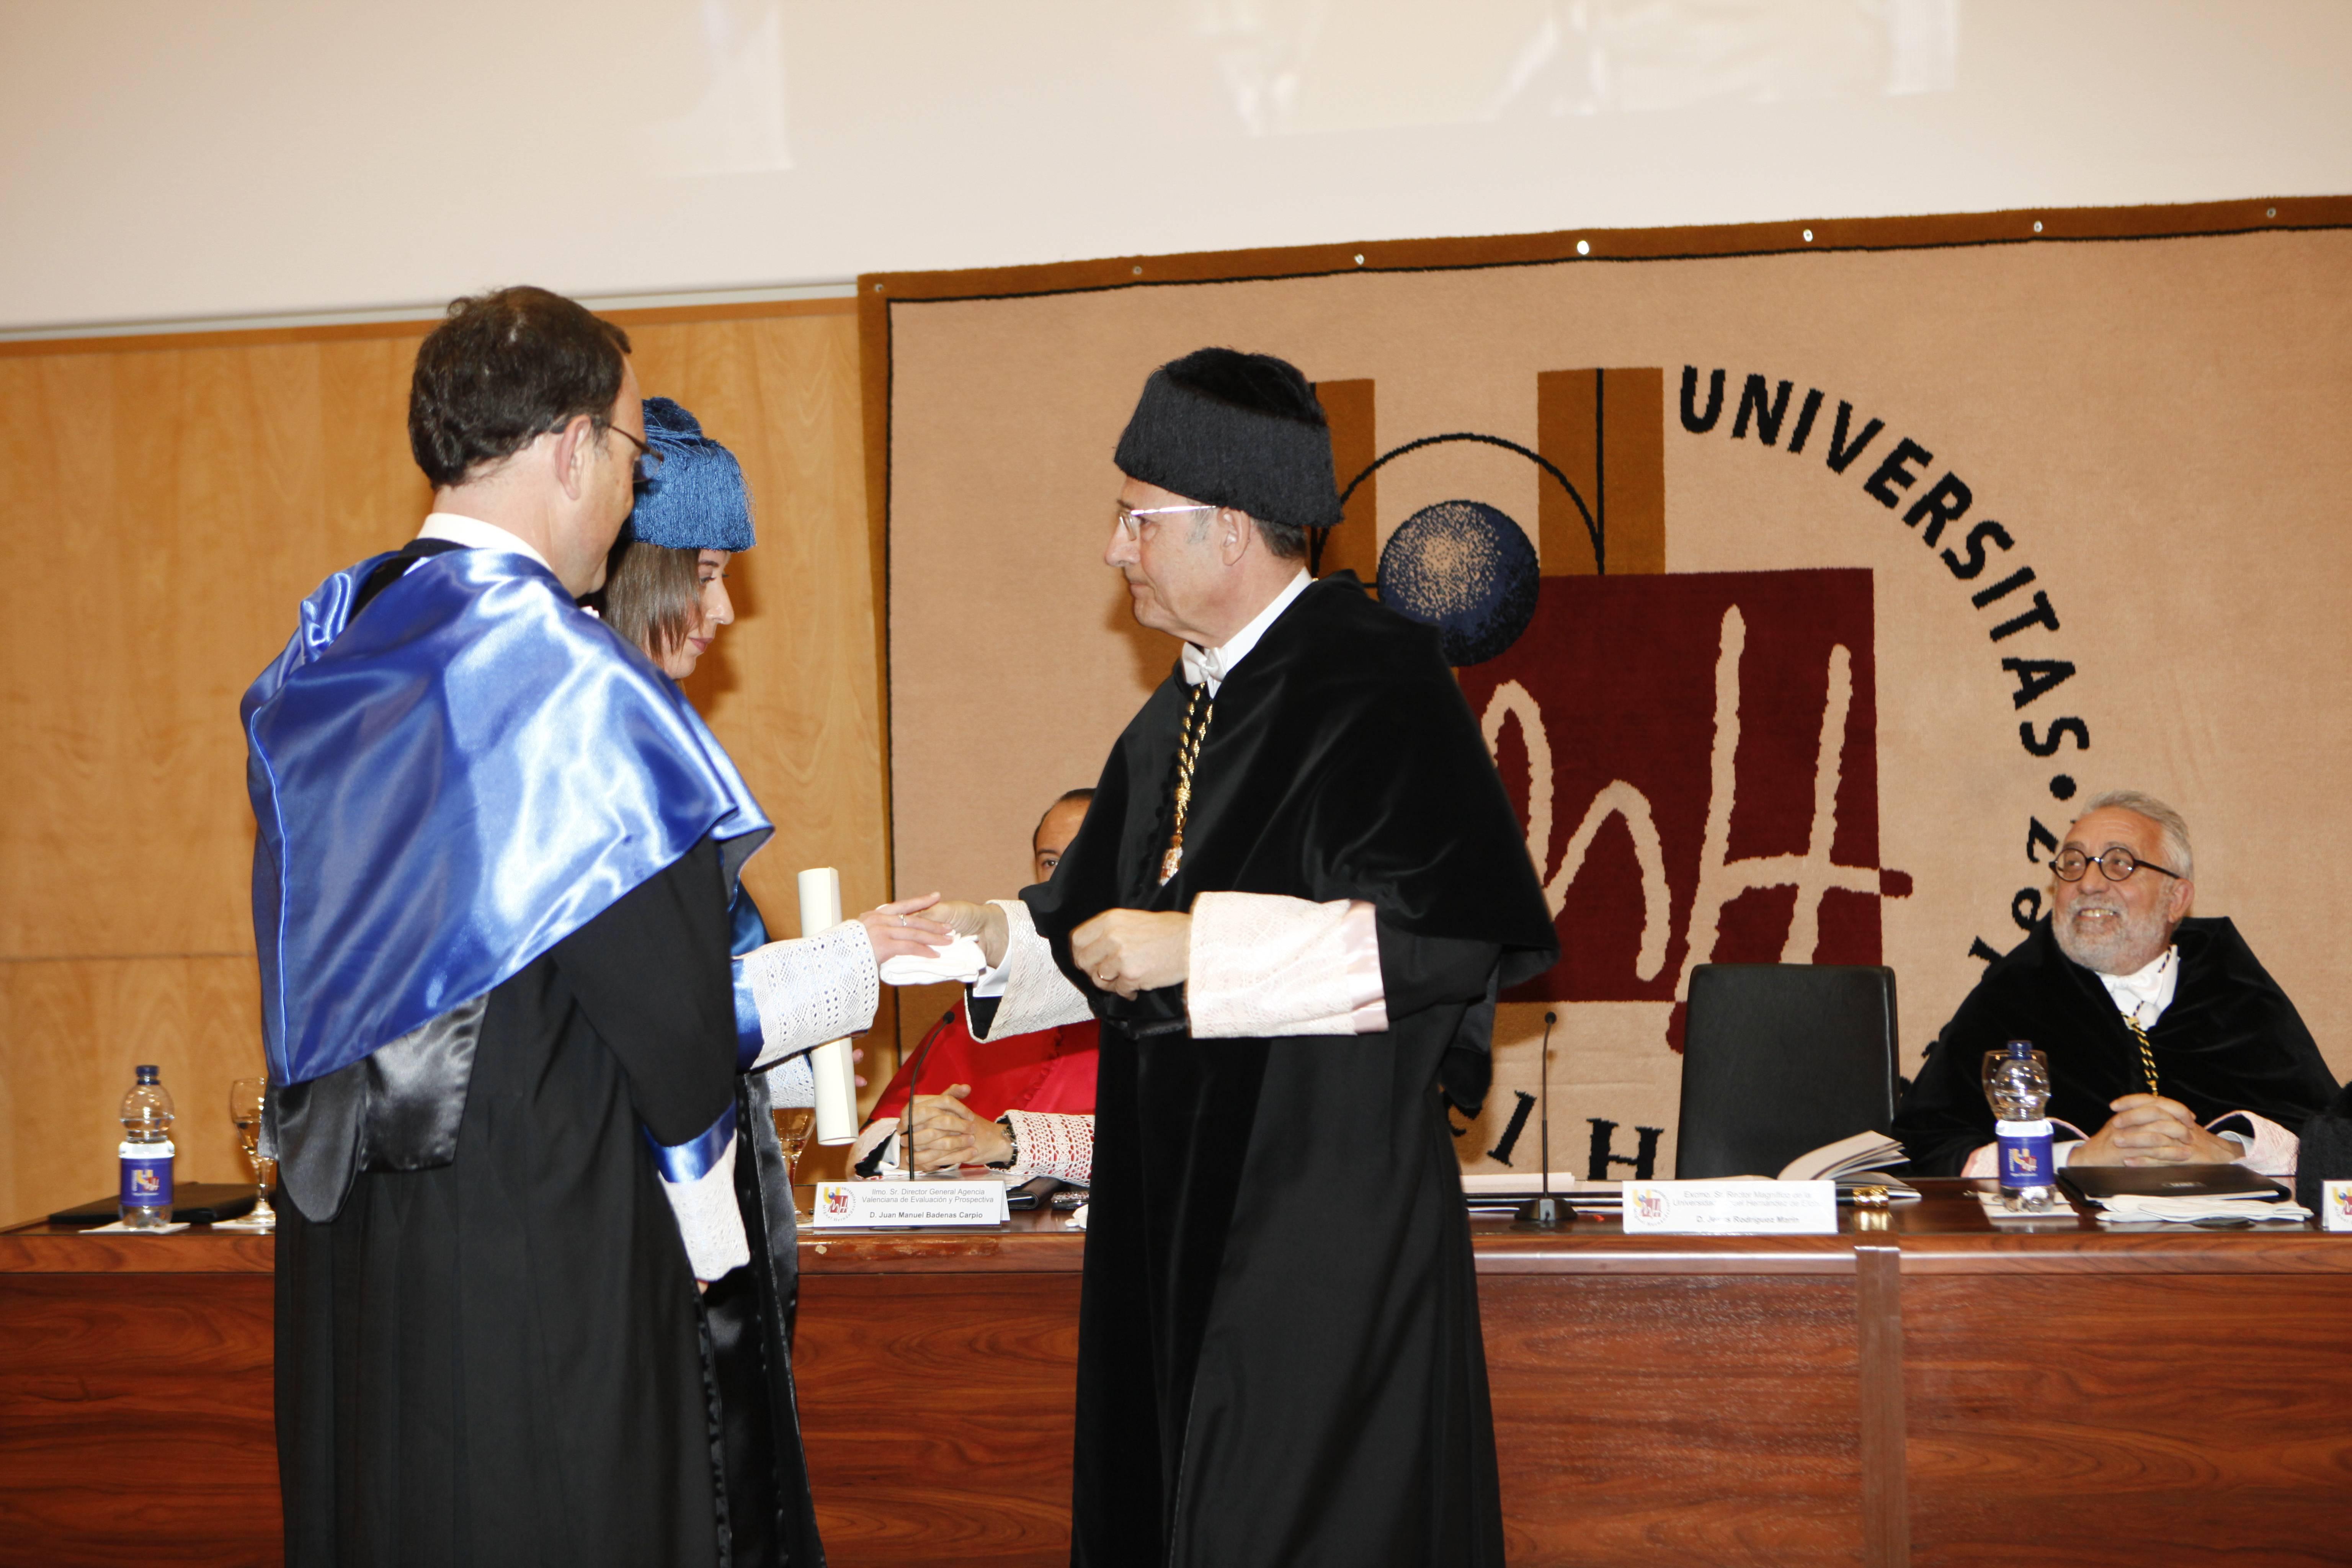 doctor-honoris-causa-luis-gamir_mg_1089.jpg